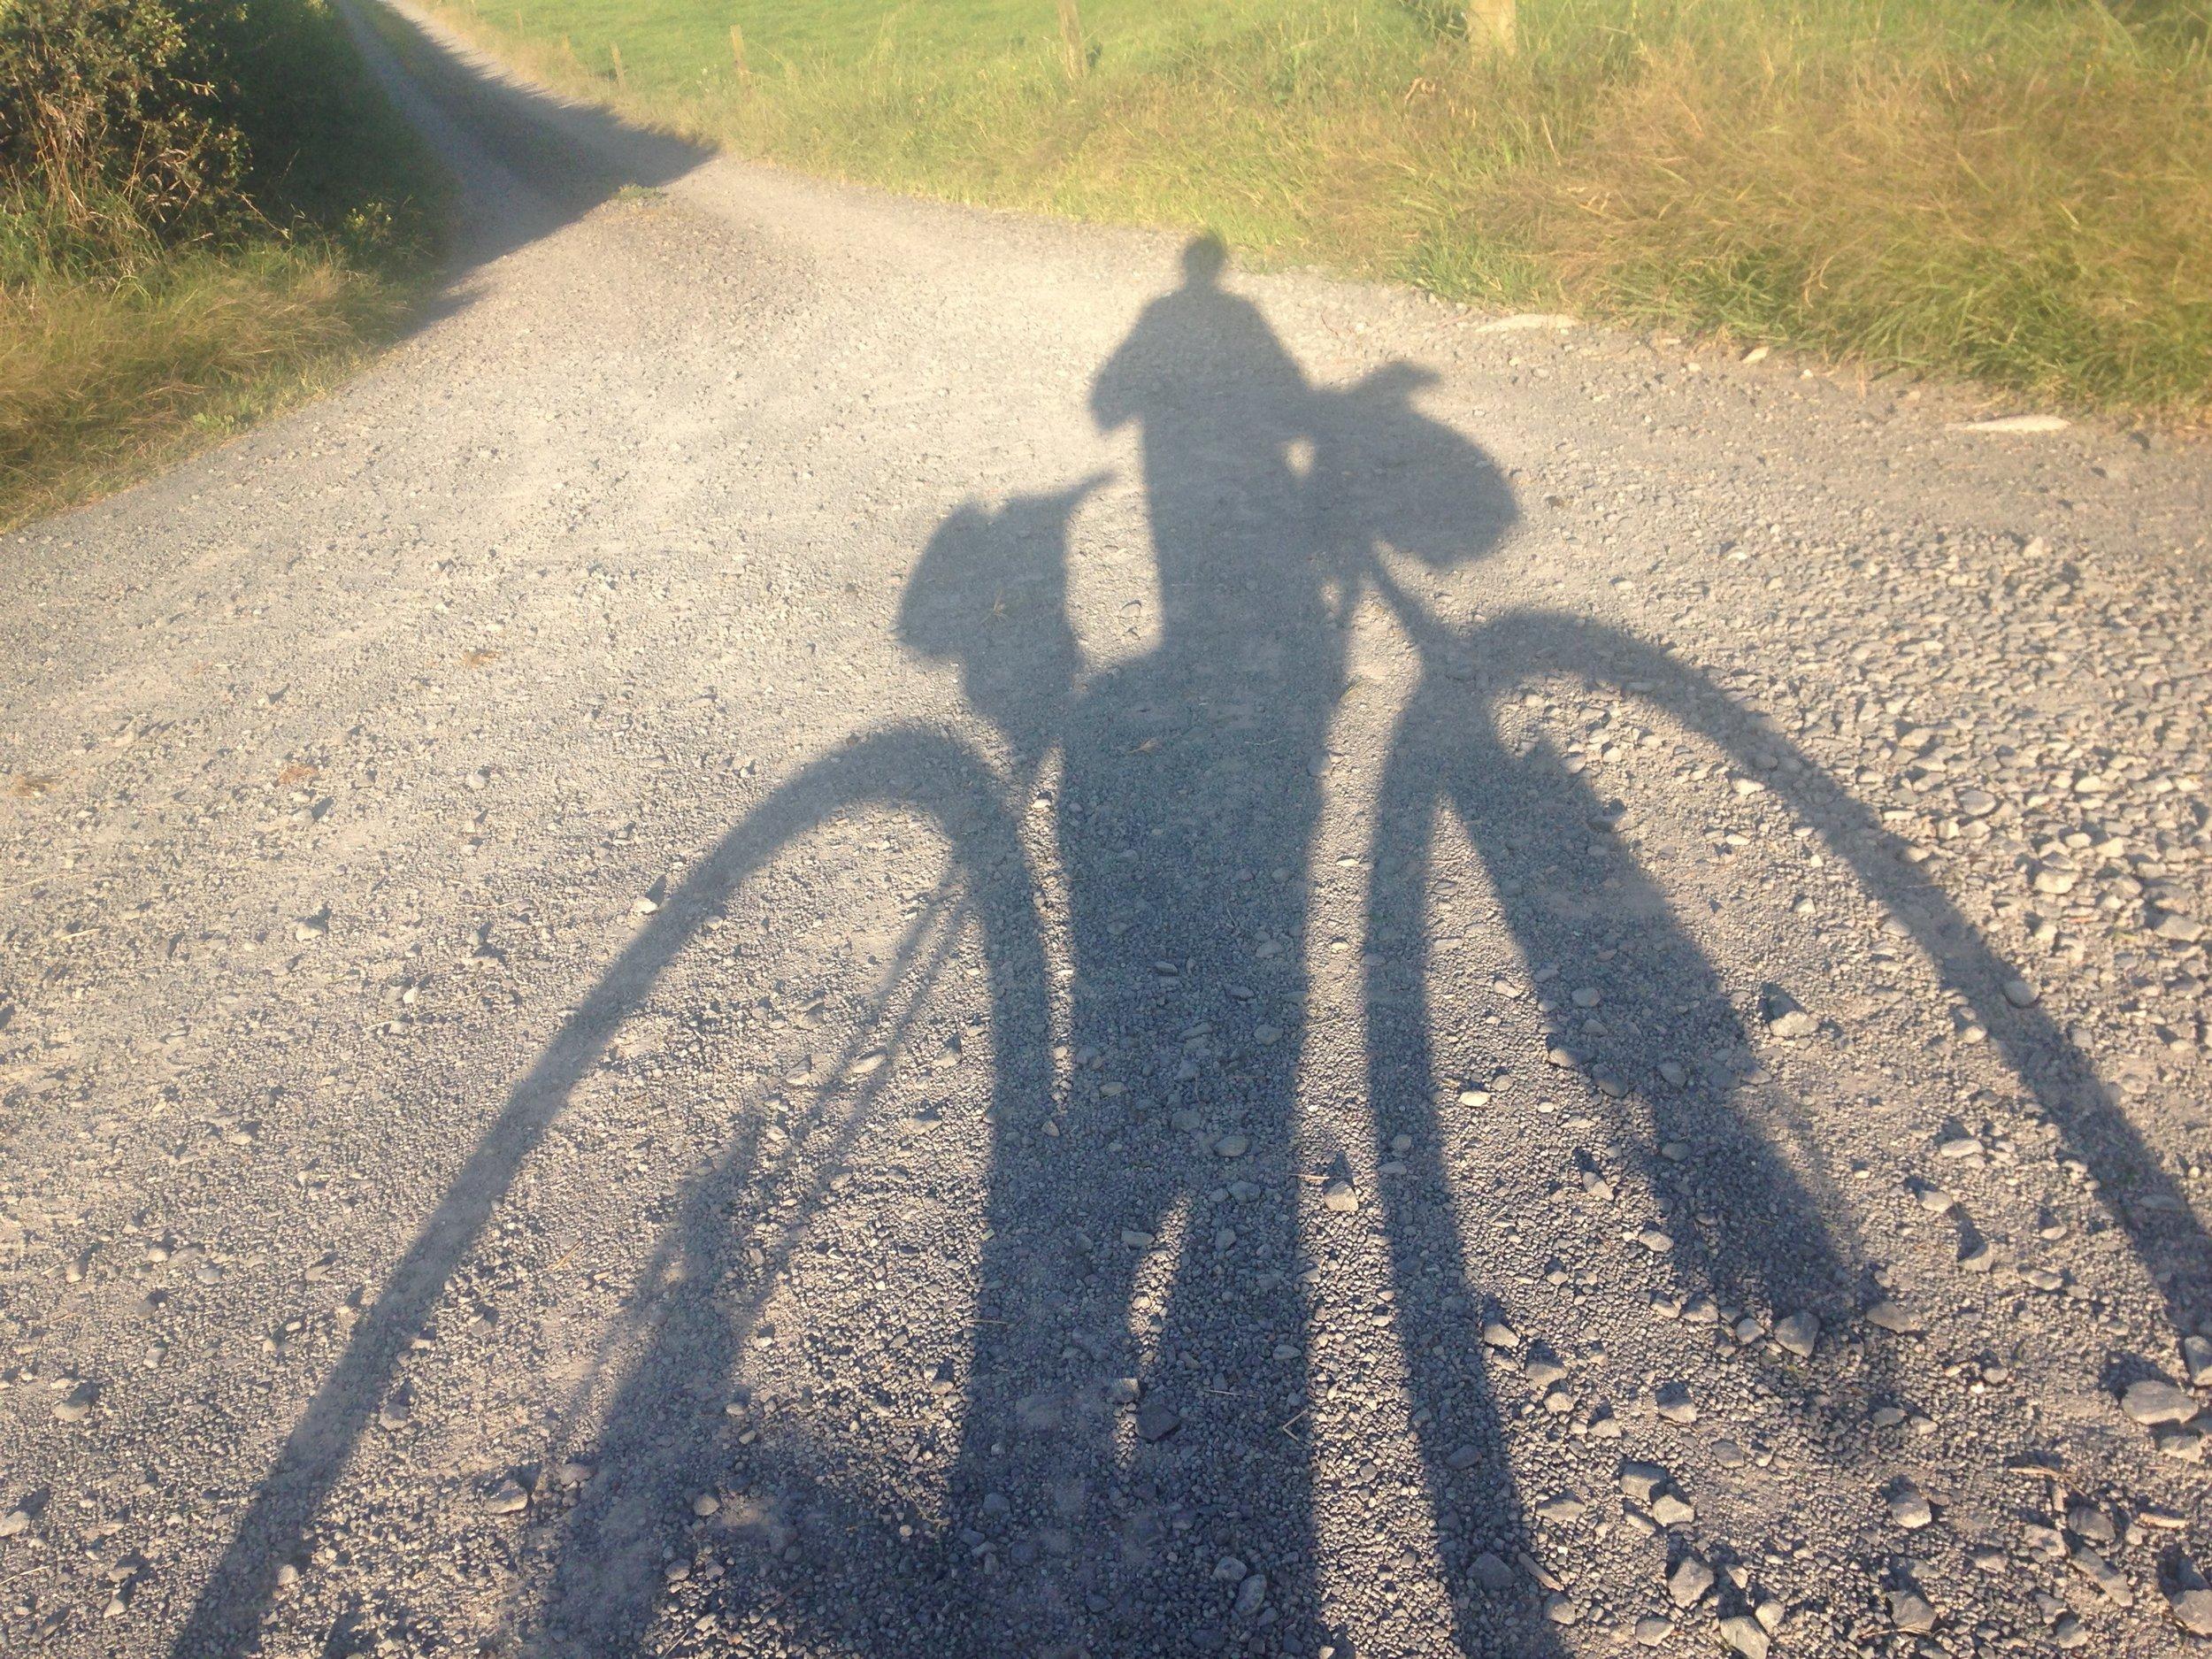 bike shadow tour aotearoa road new zealand.JPG